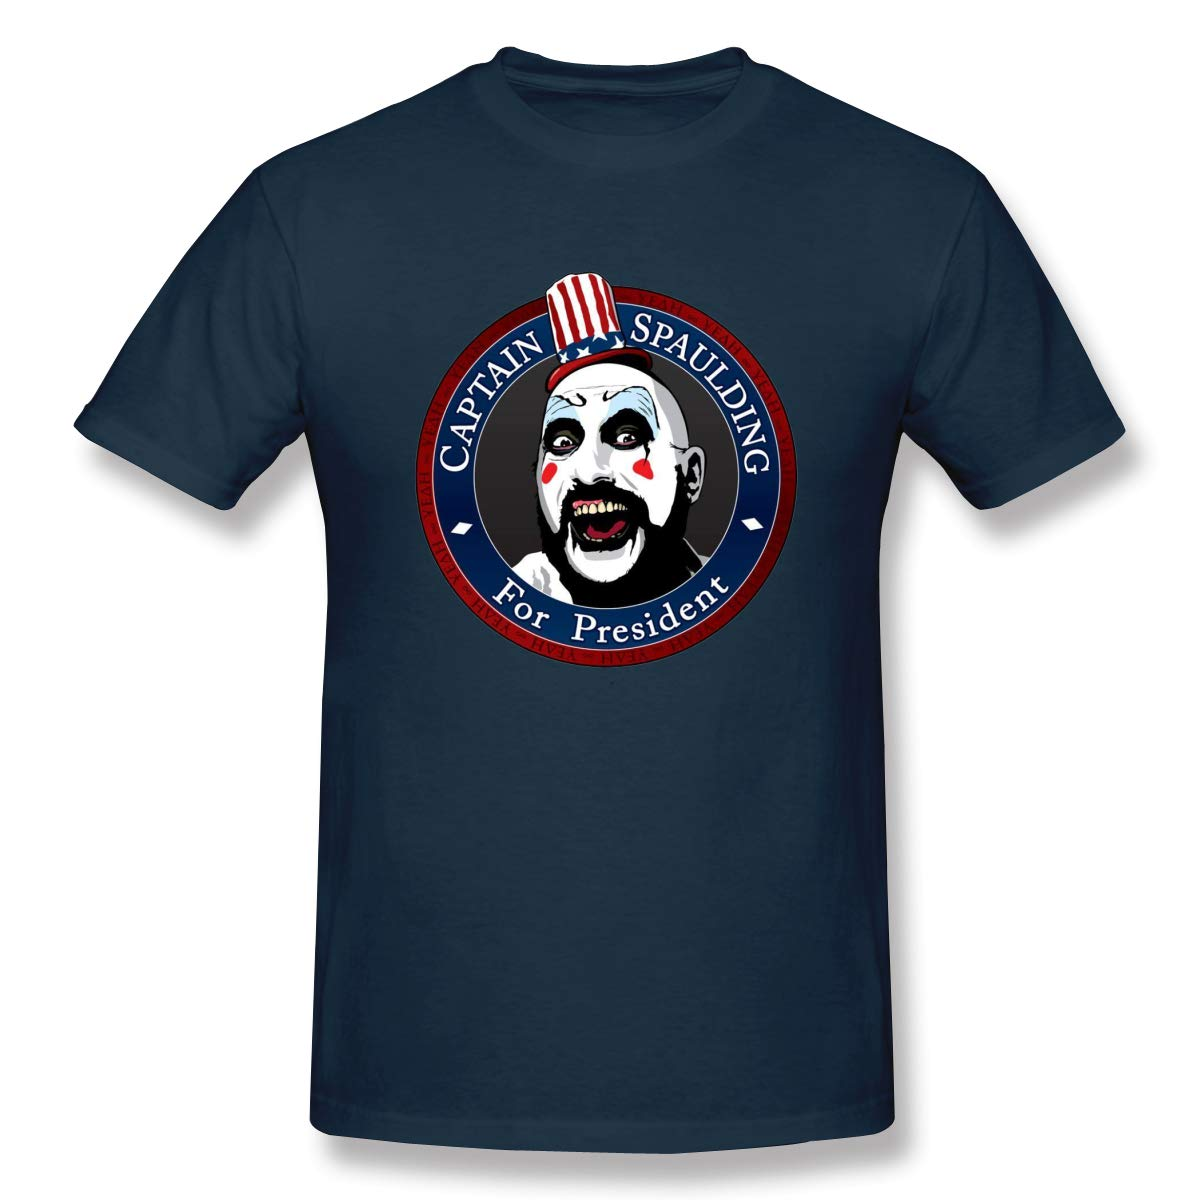 Gallagher Captain Spaulding For President Casual T Shirt Short Sleeve Tee For